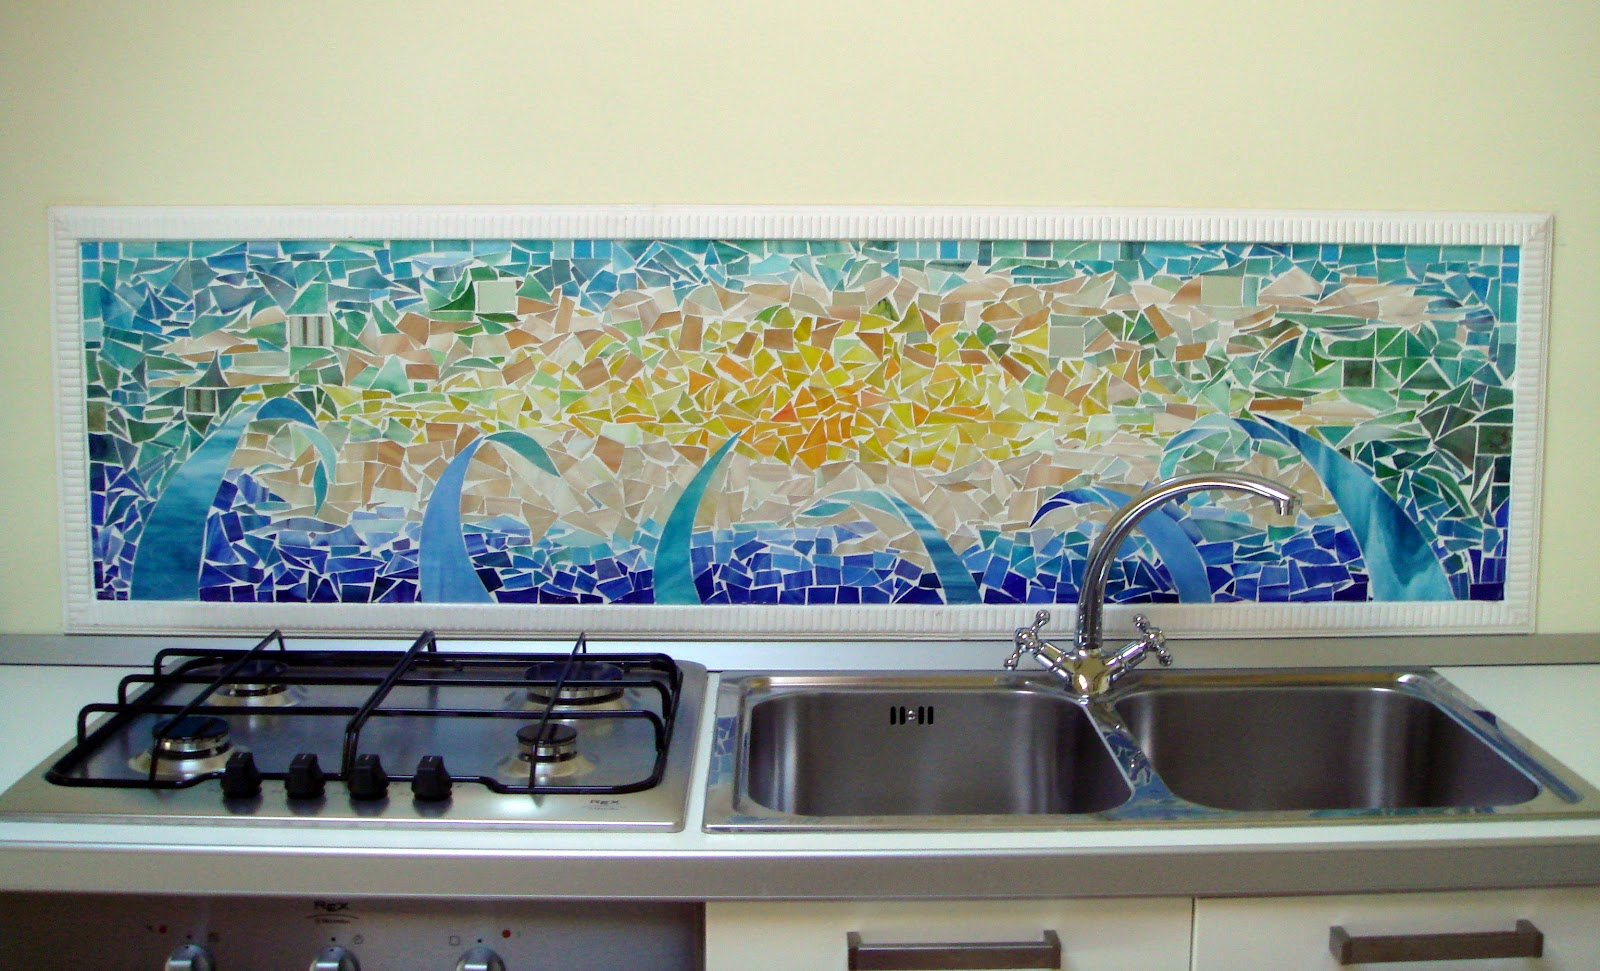 Piastrelle a mosaico per cucina piastrelle mosaico in cucina